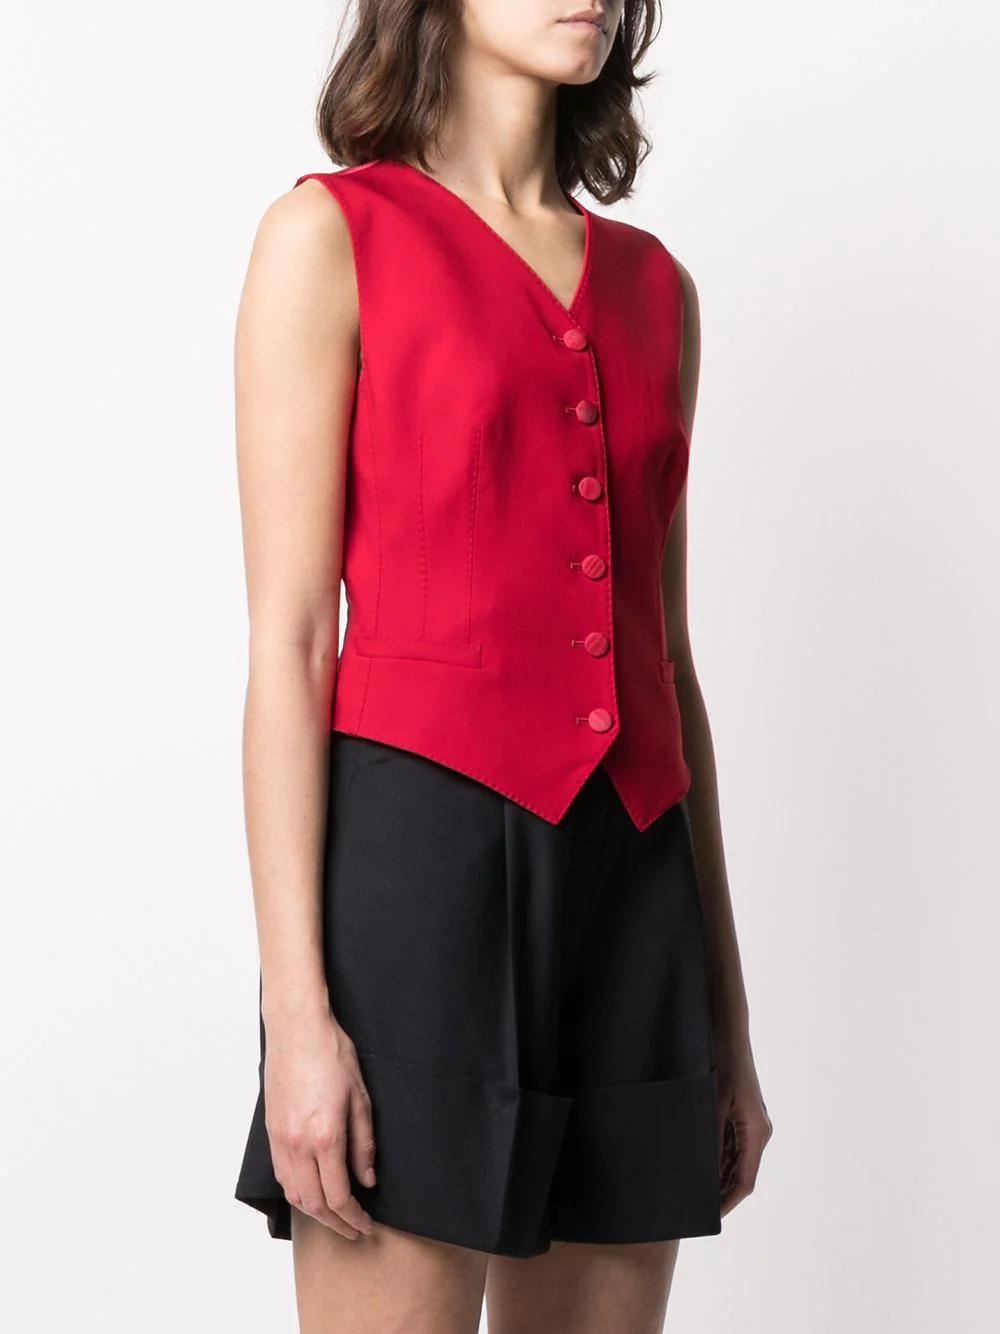 Dolce & Gabbana Fitted Silk Waistcoat 815лв